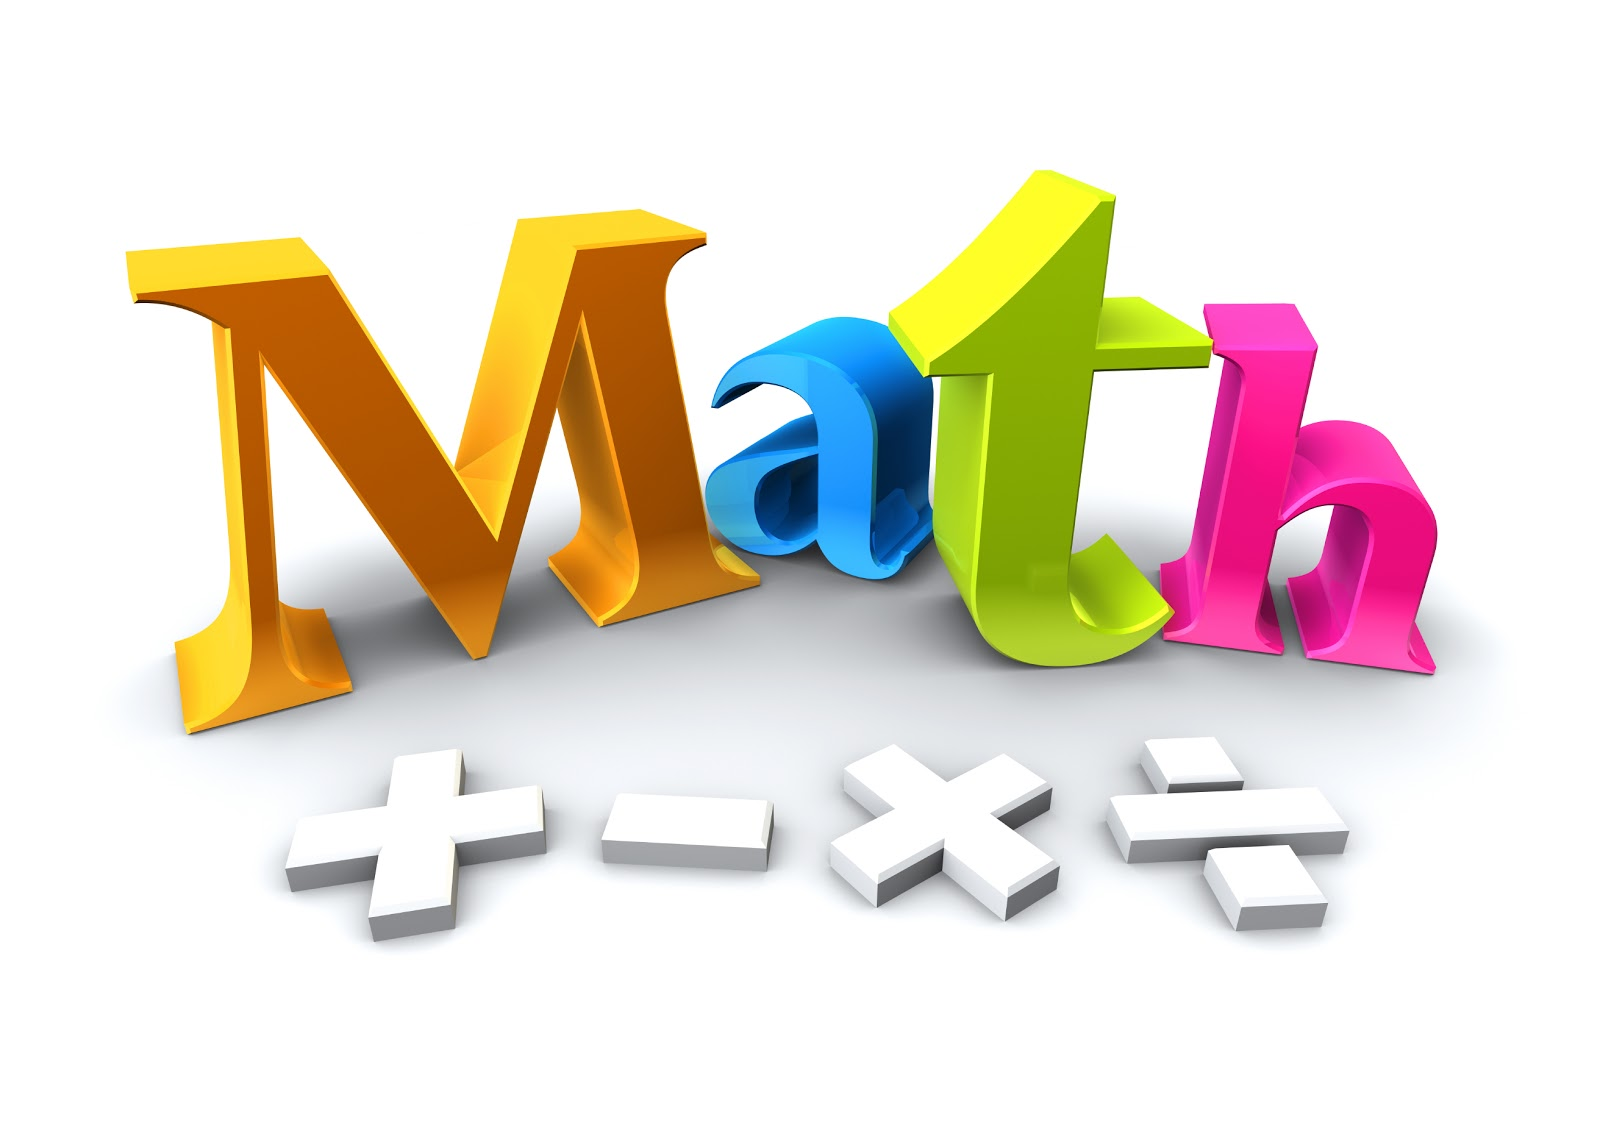 Media Pembelajaran Matematika Kelas 4 Sd Mengajar Matematika